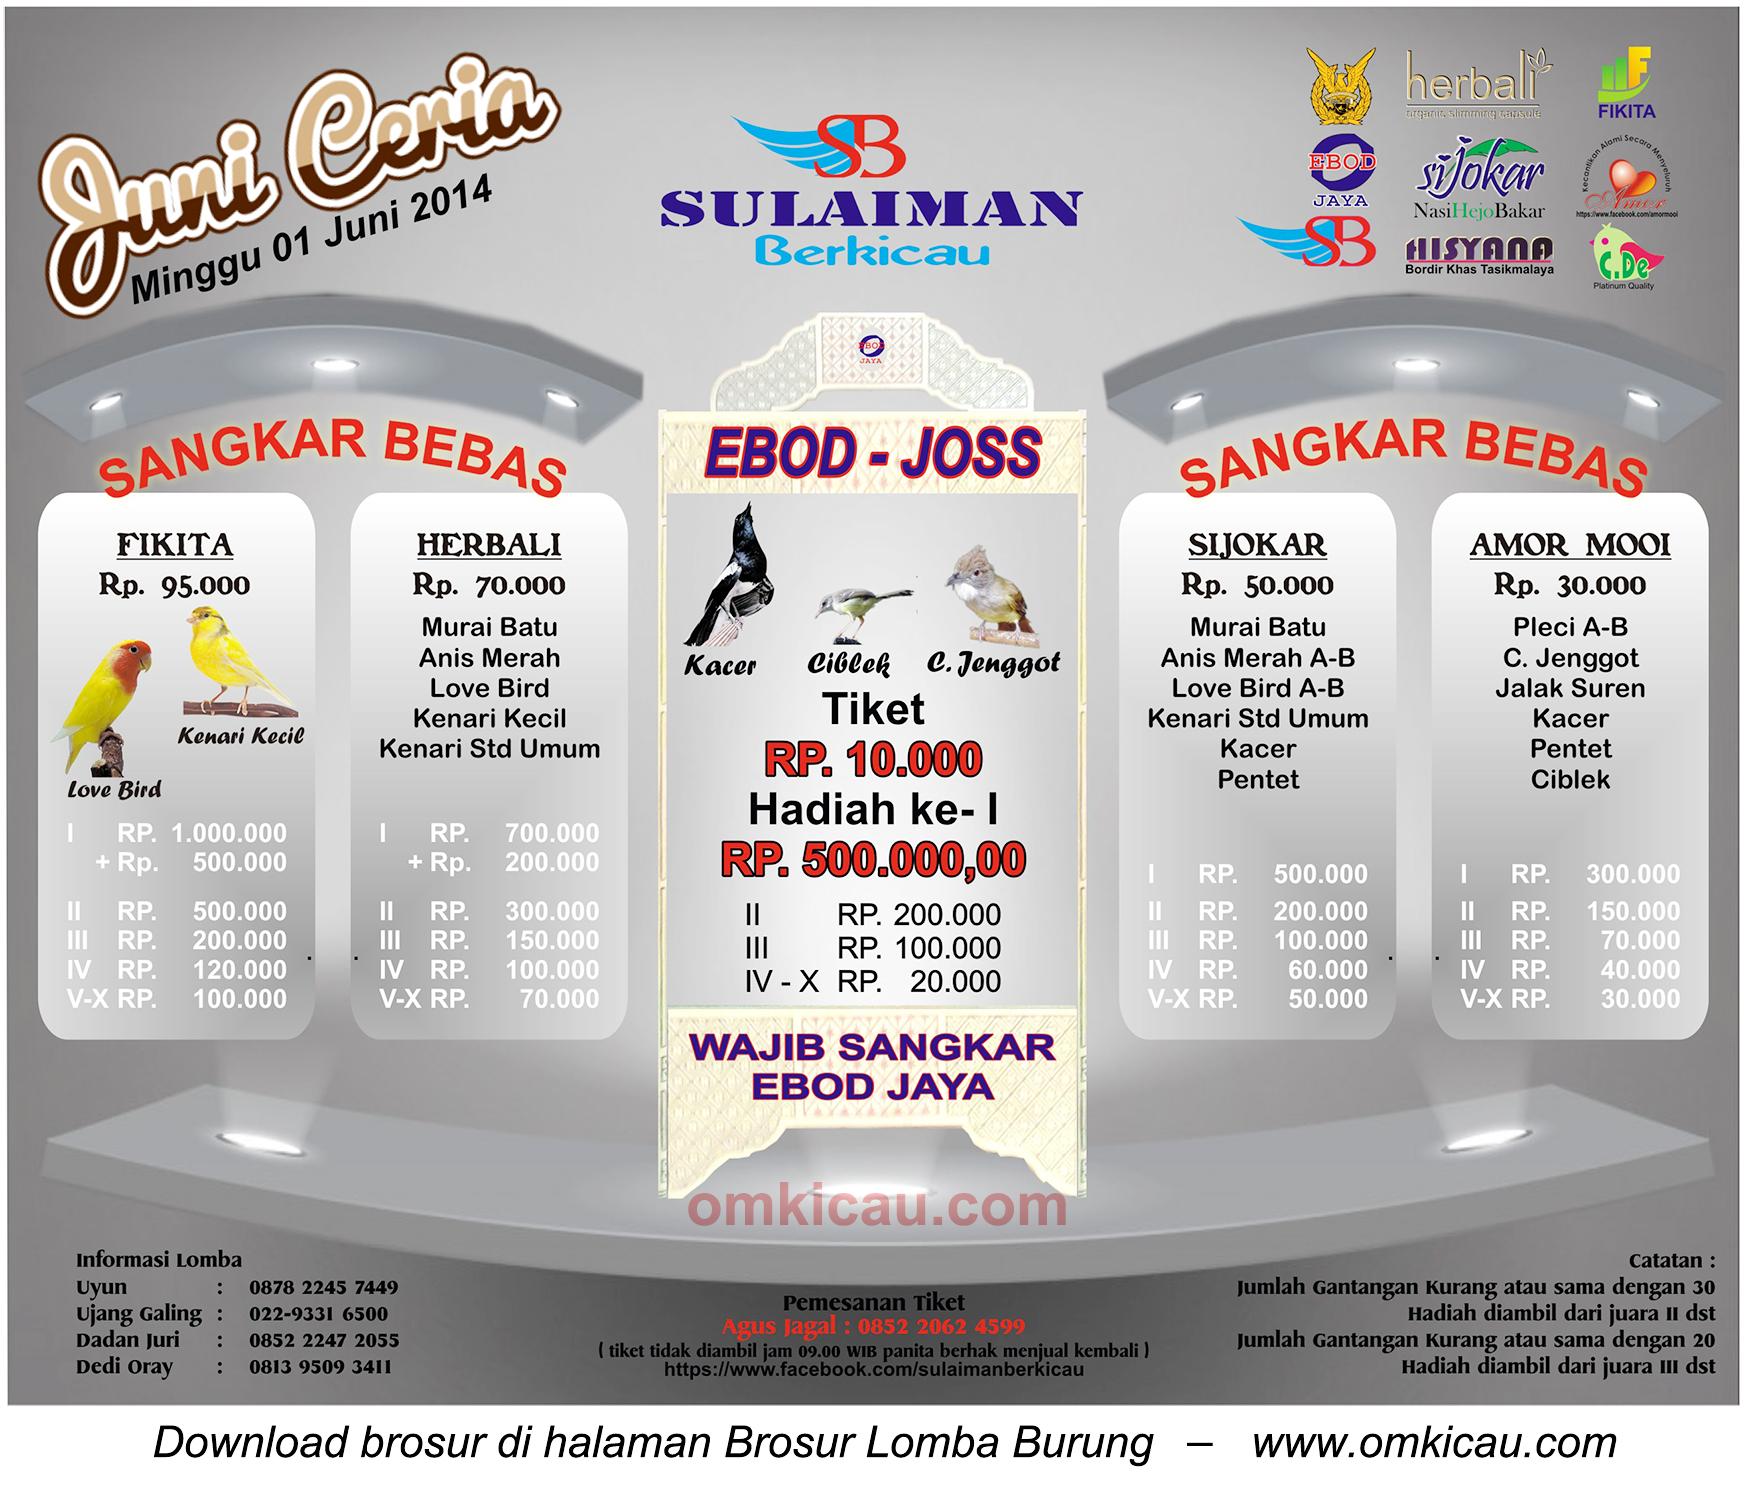 Brosur Lomba Burung Juni Ceria - Sulaiman Berkicau, Bandung, 1 Juni 2014